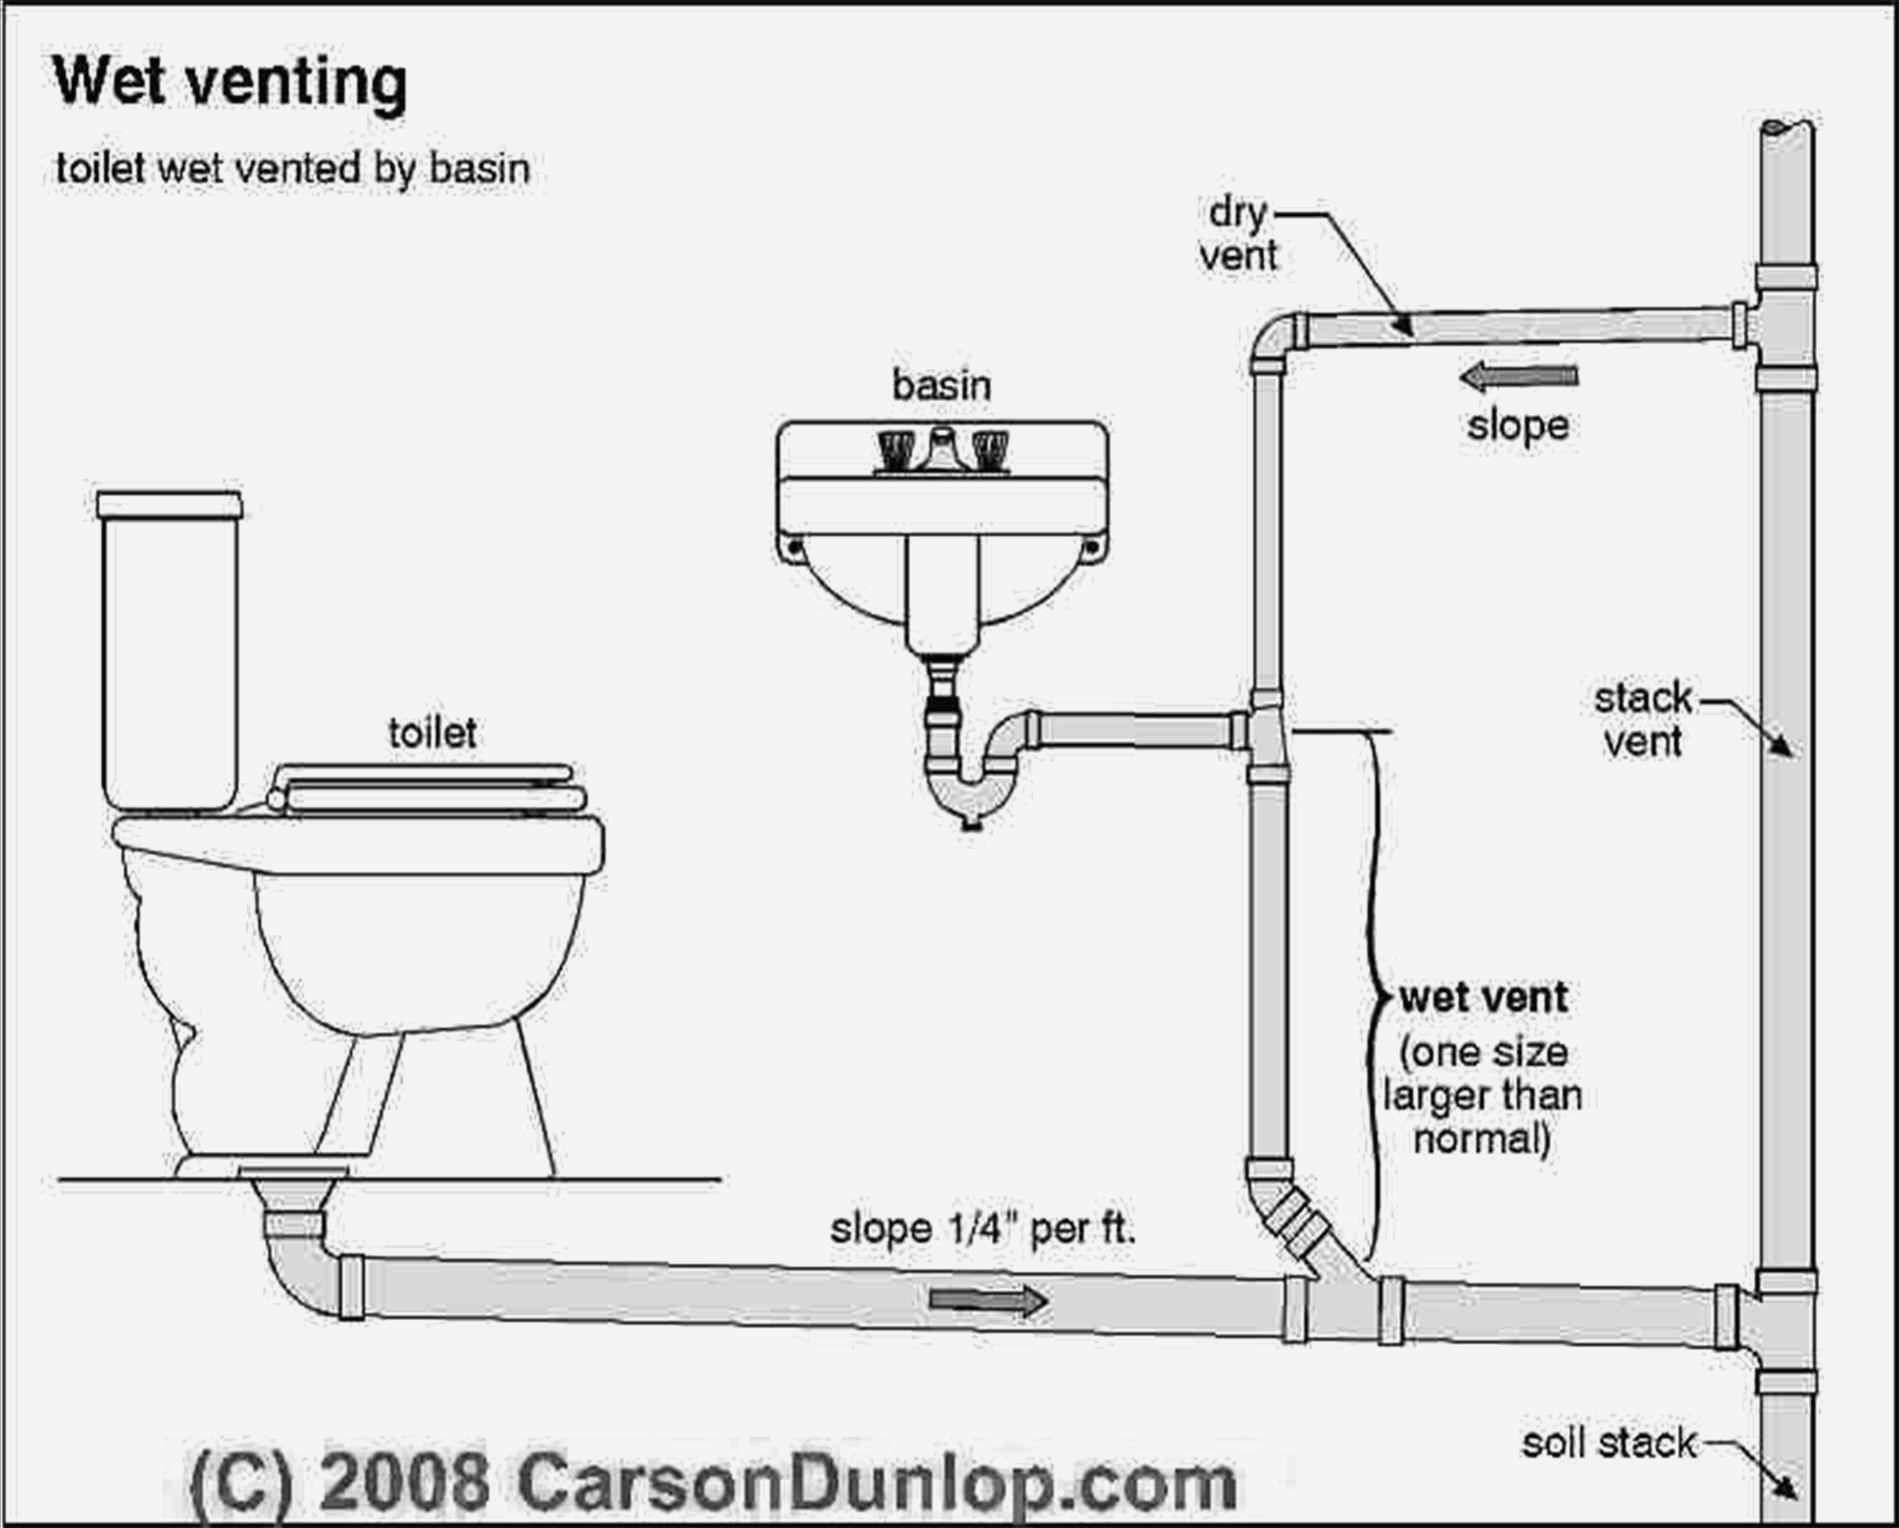 Wiring Diagram Bathroom Lovely Wiring Diagram Bathroom Bathroom Fan Light Wiring Diagram Mikulskilawoffices Plumbing Vent Bathroom Plumbing Toilet Vent